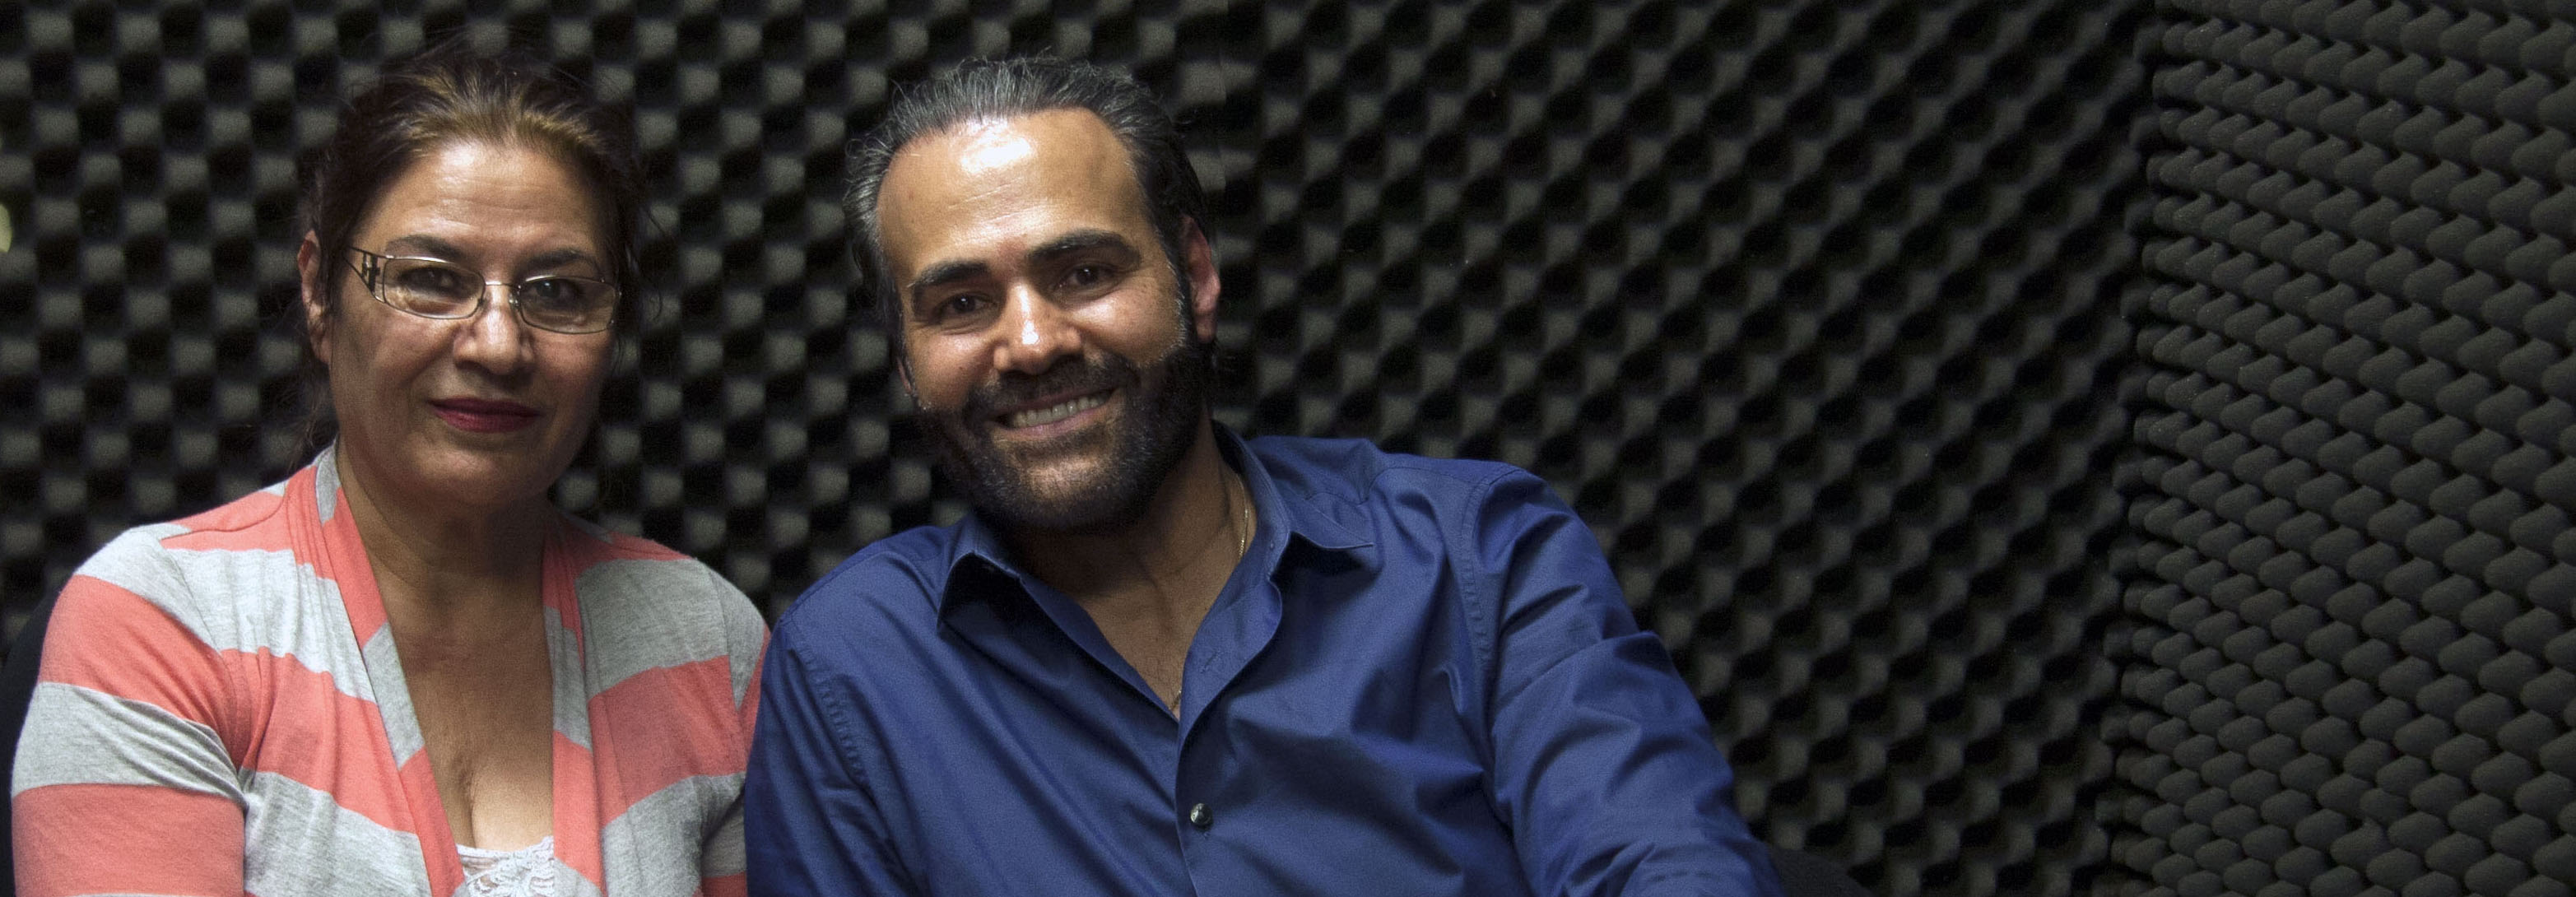 Farsi Show – 04.15.15 – Movies with Ali Saam